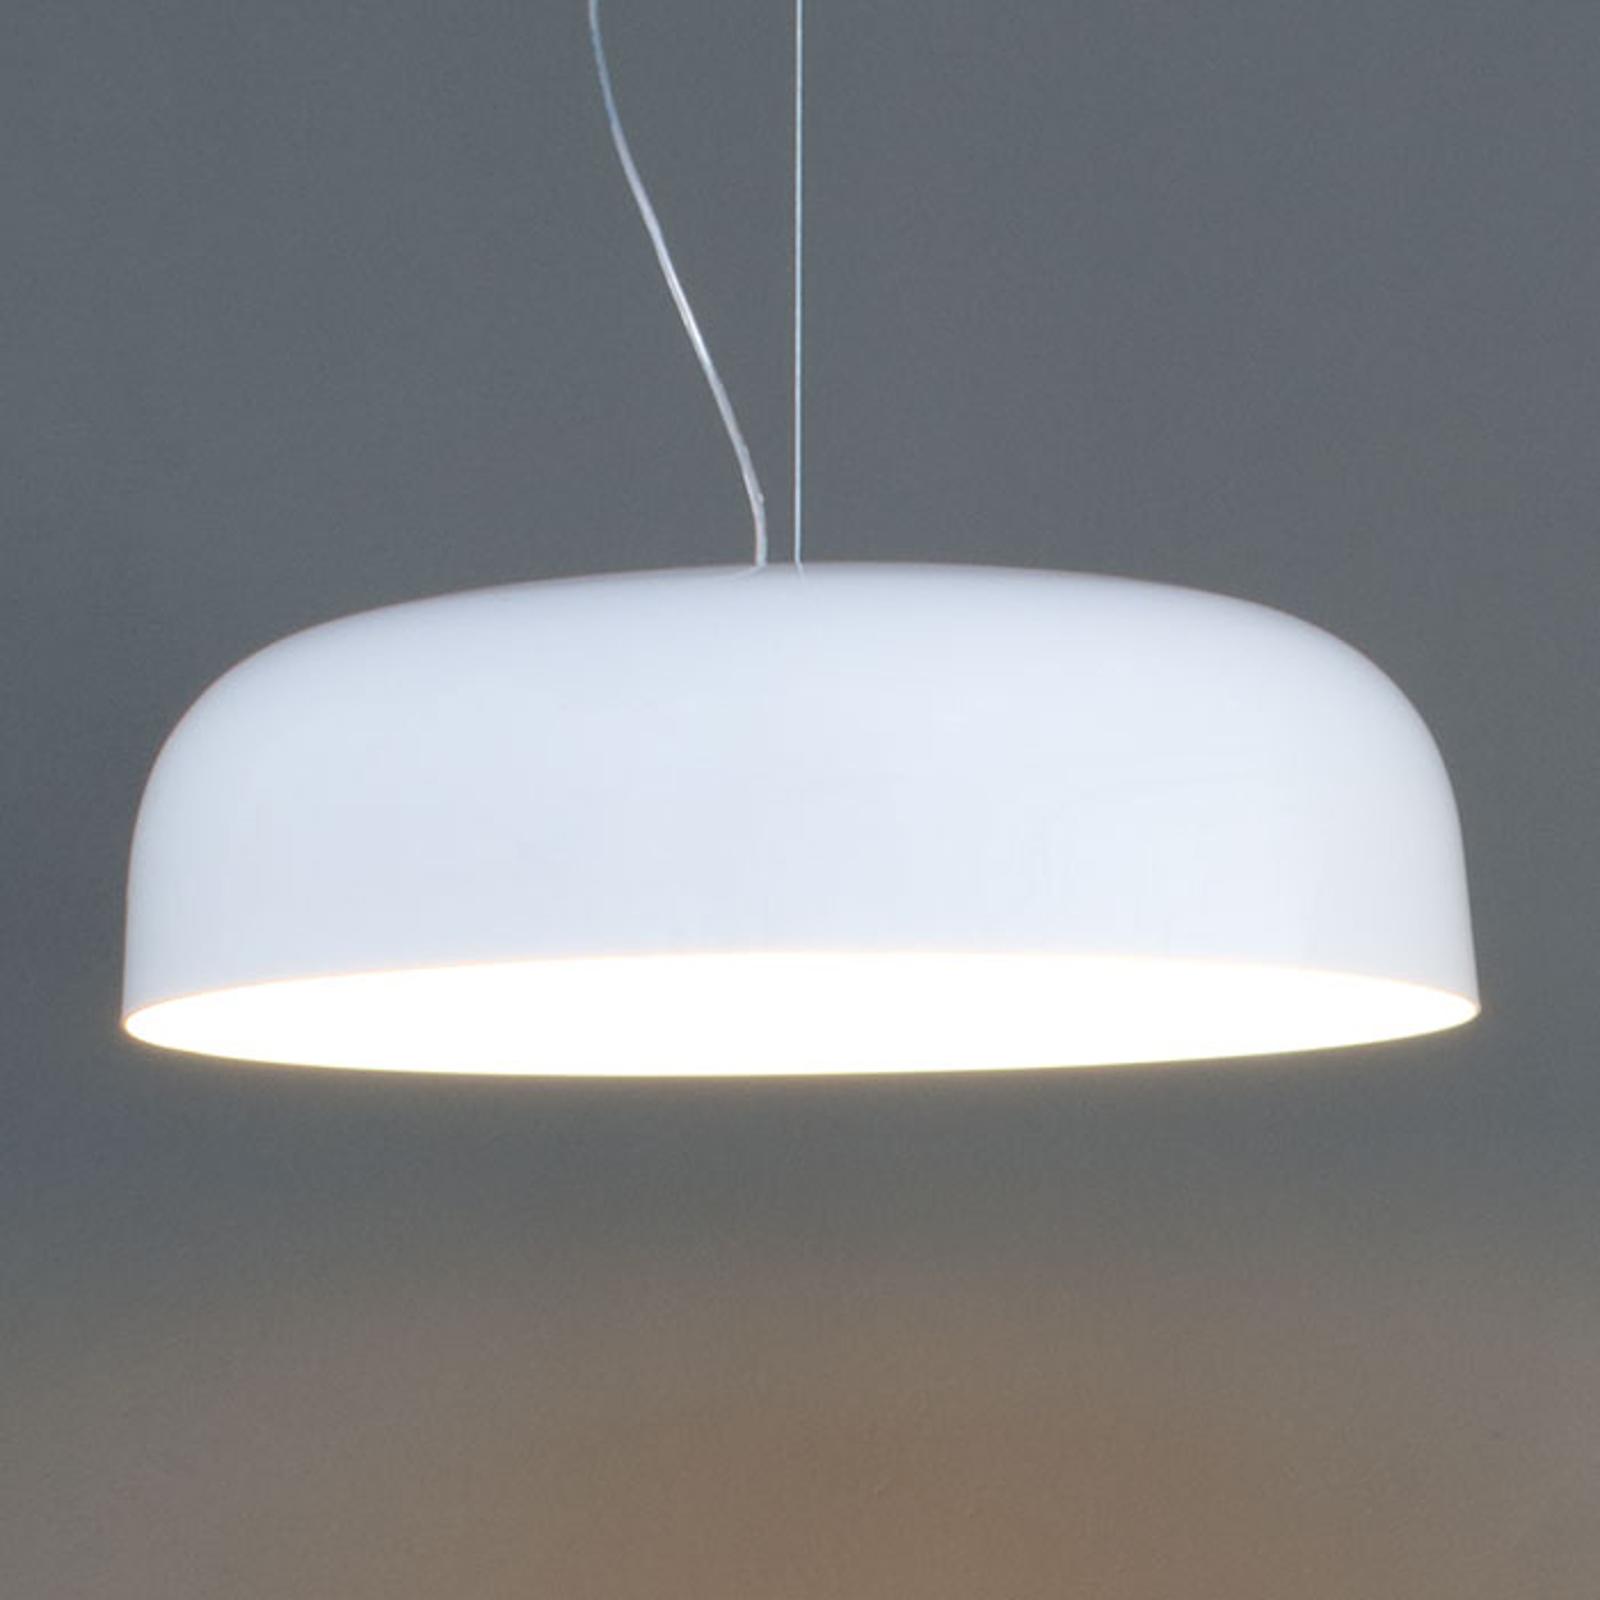 Oluce Canopy - hanglamp, 60 cm, wit